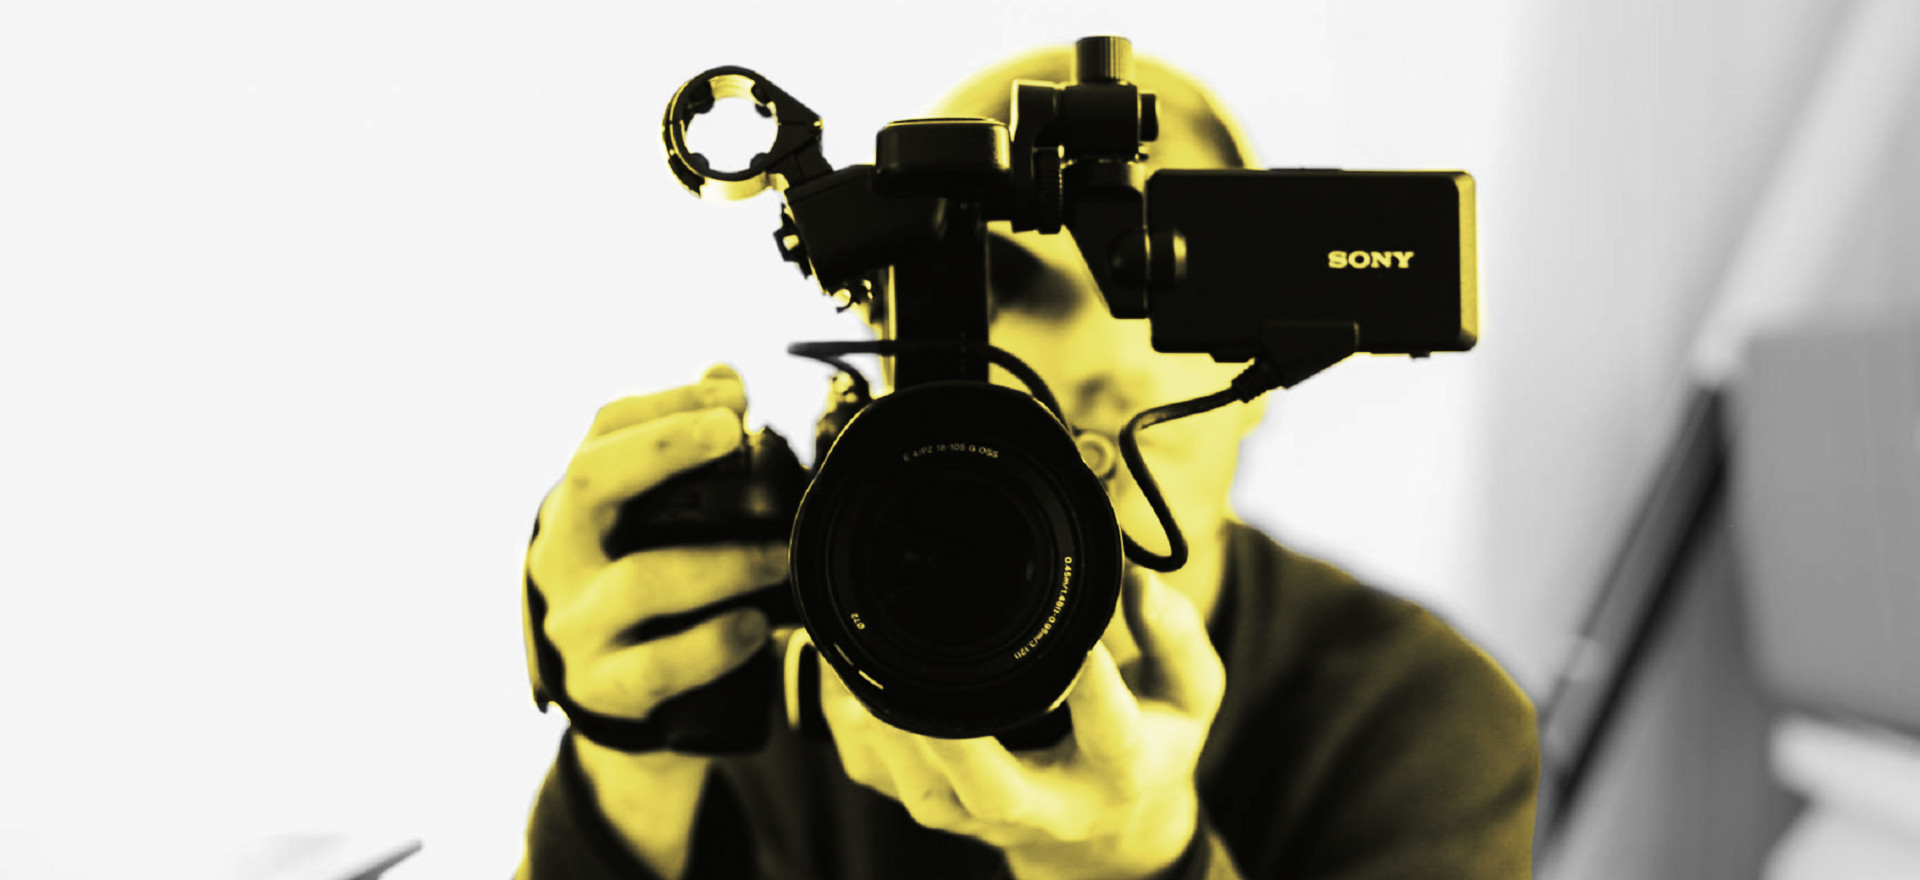 Symbolbild VJ auf Pixabay von StockSnap crossmedialer Journalismus